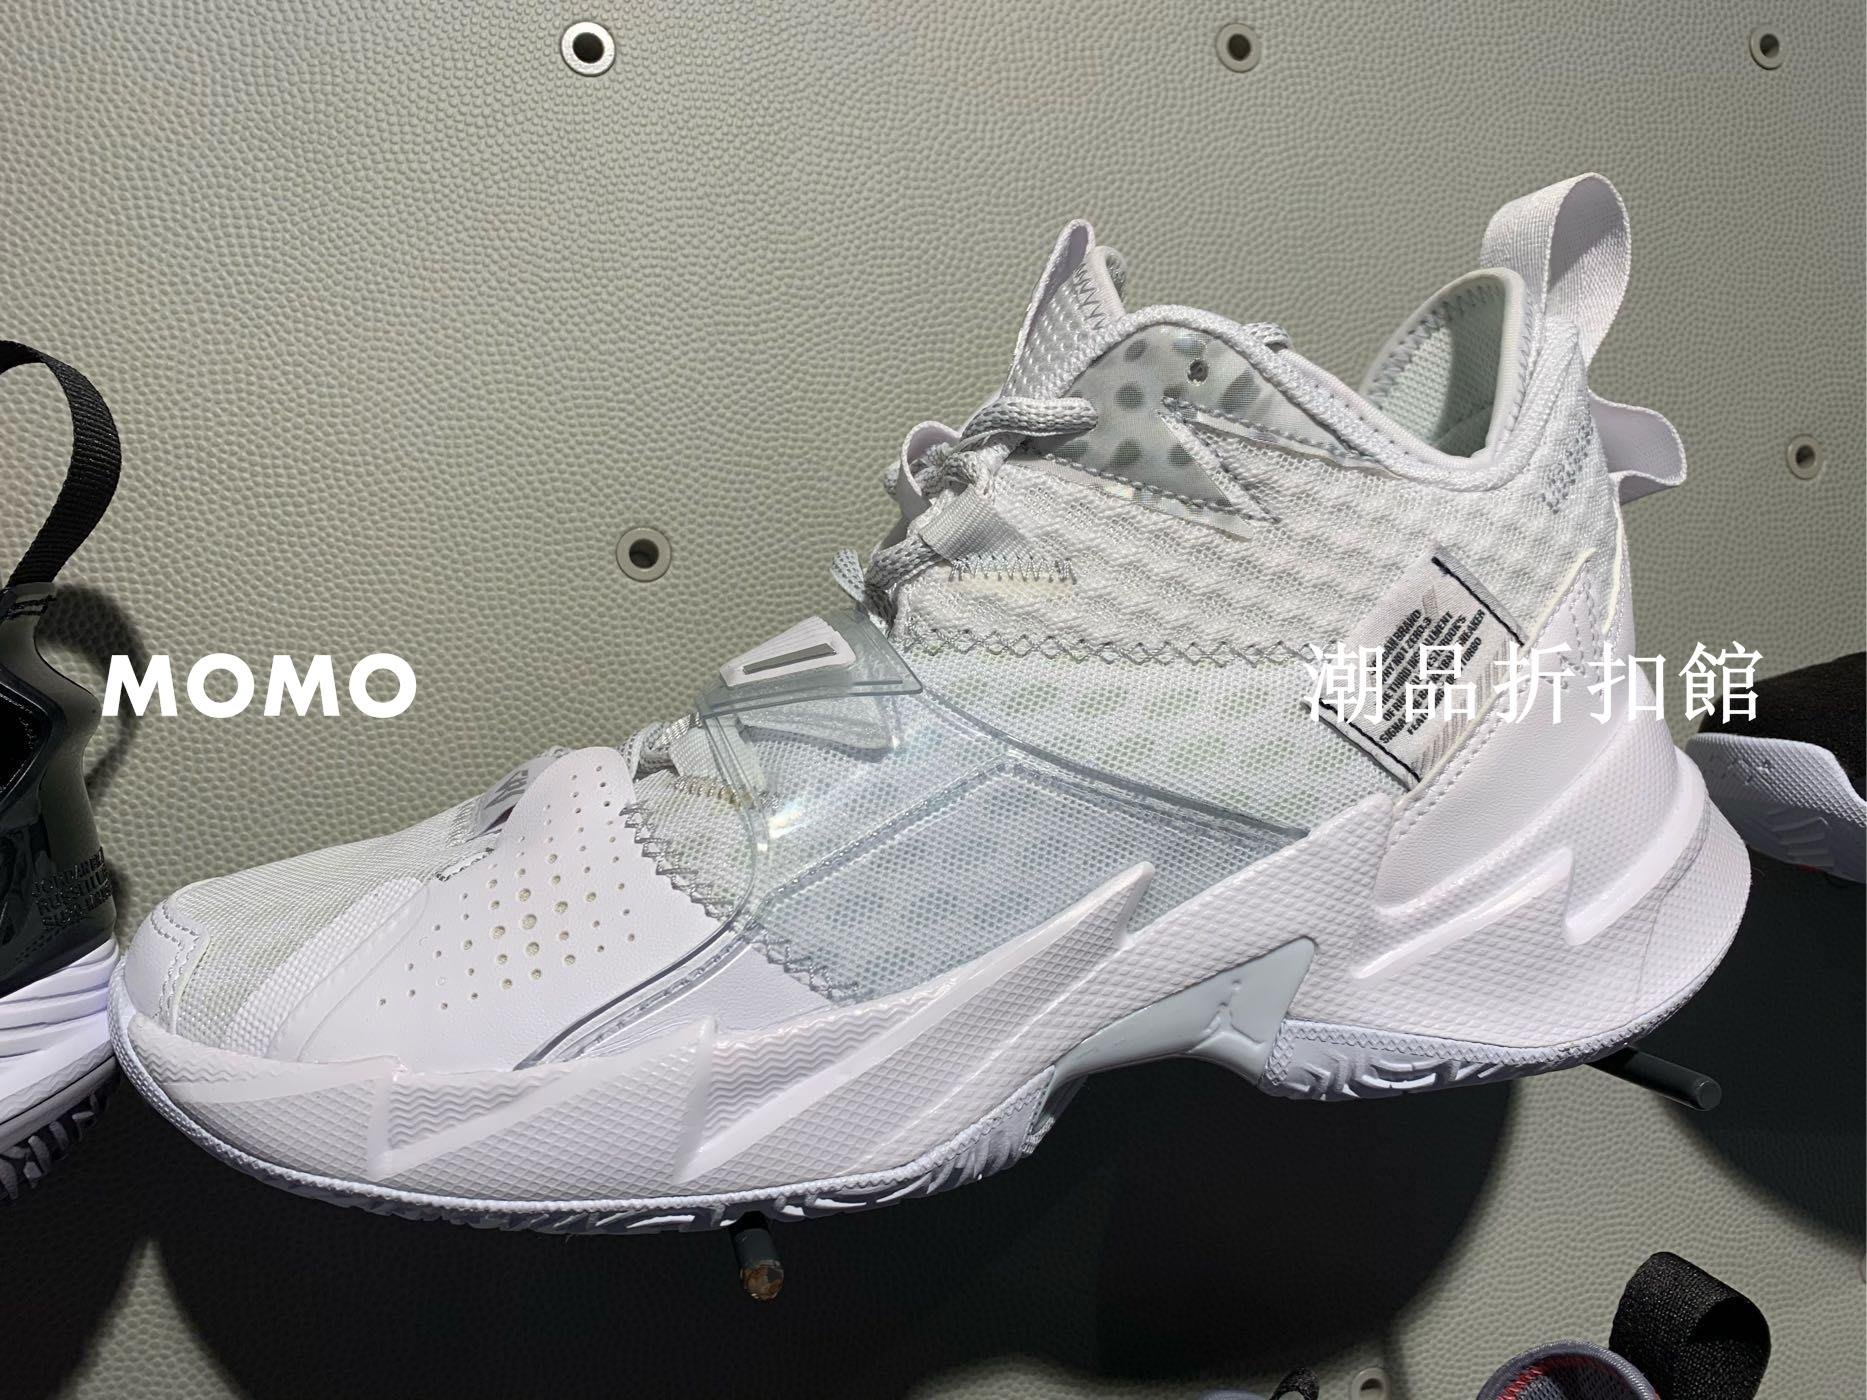 【MOMO潮品館】Jordan why not zer0.3 全白 威少 籃球鞋 US8-11